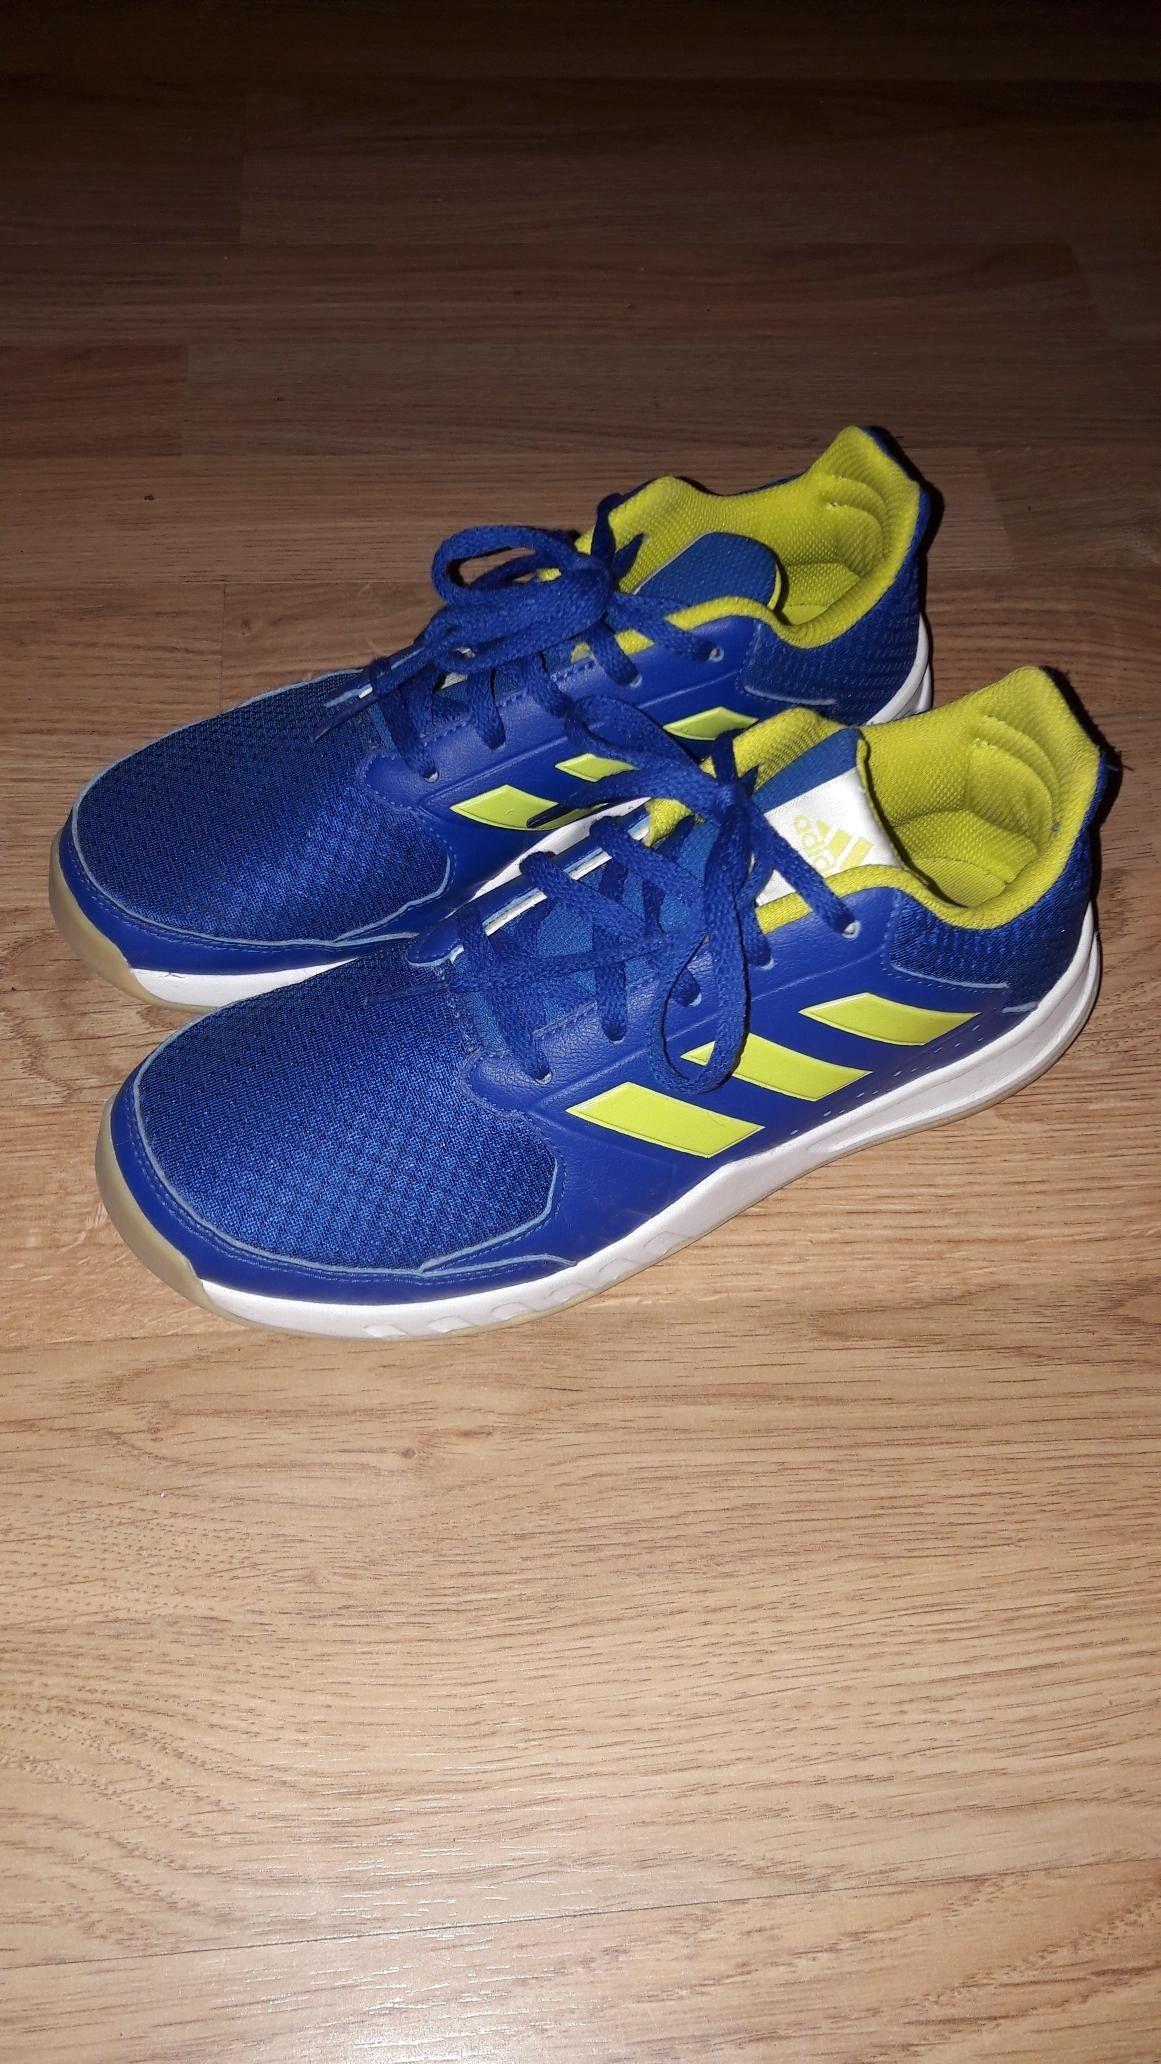 Adidas sko str.38 | FINN.no